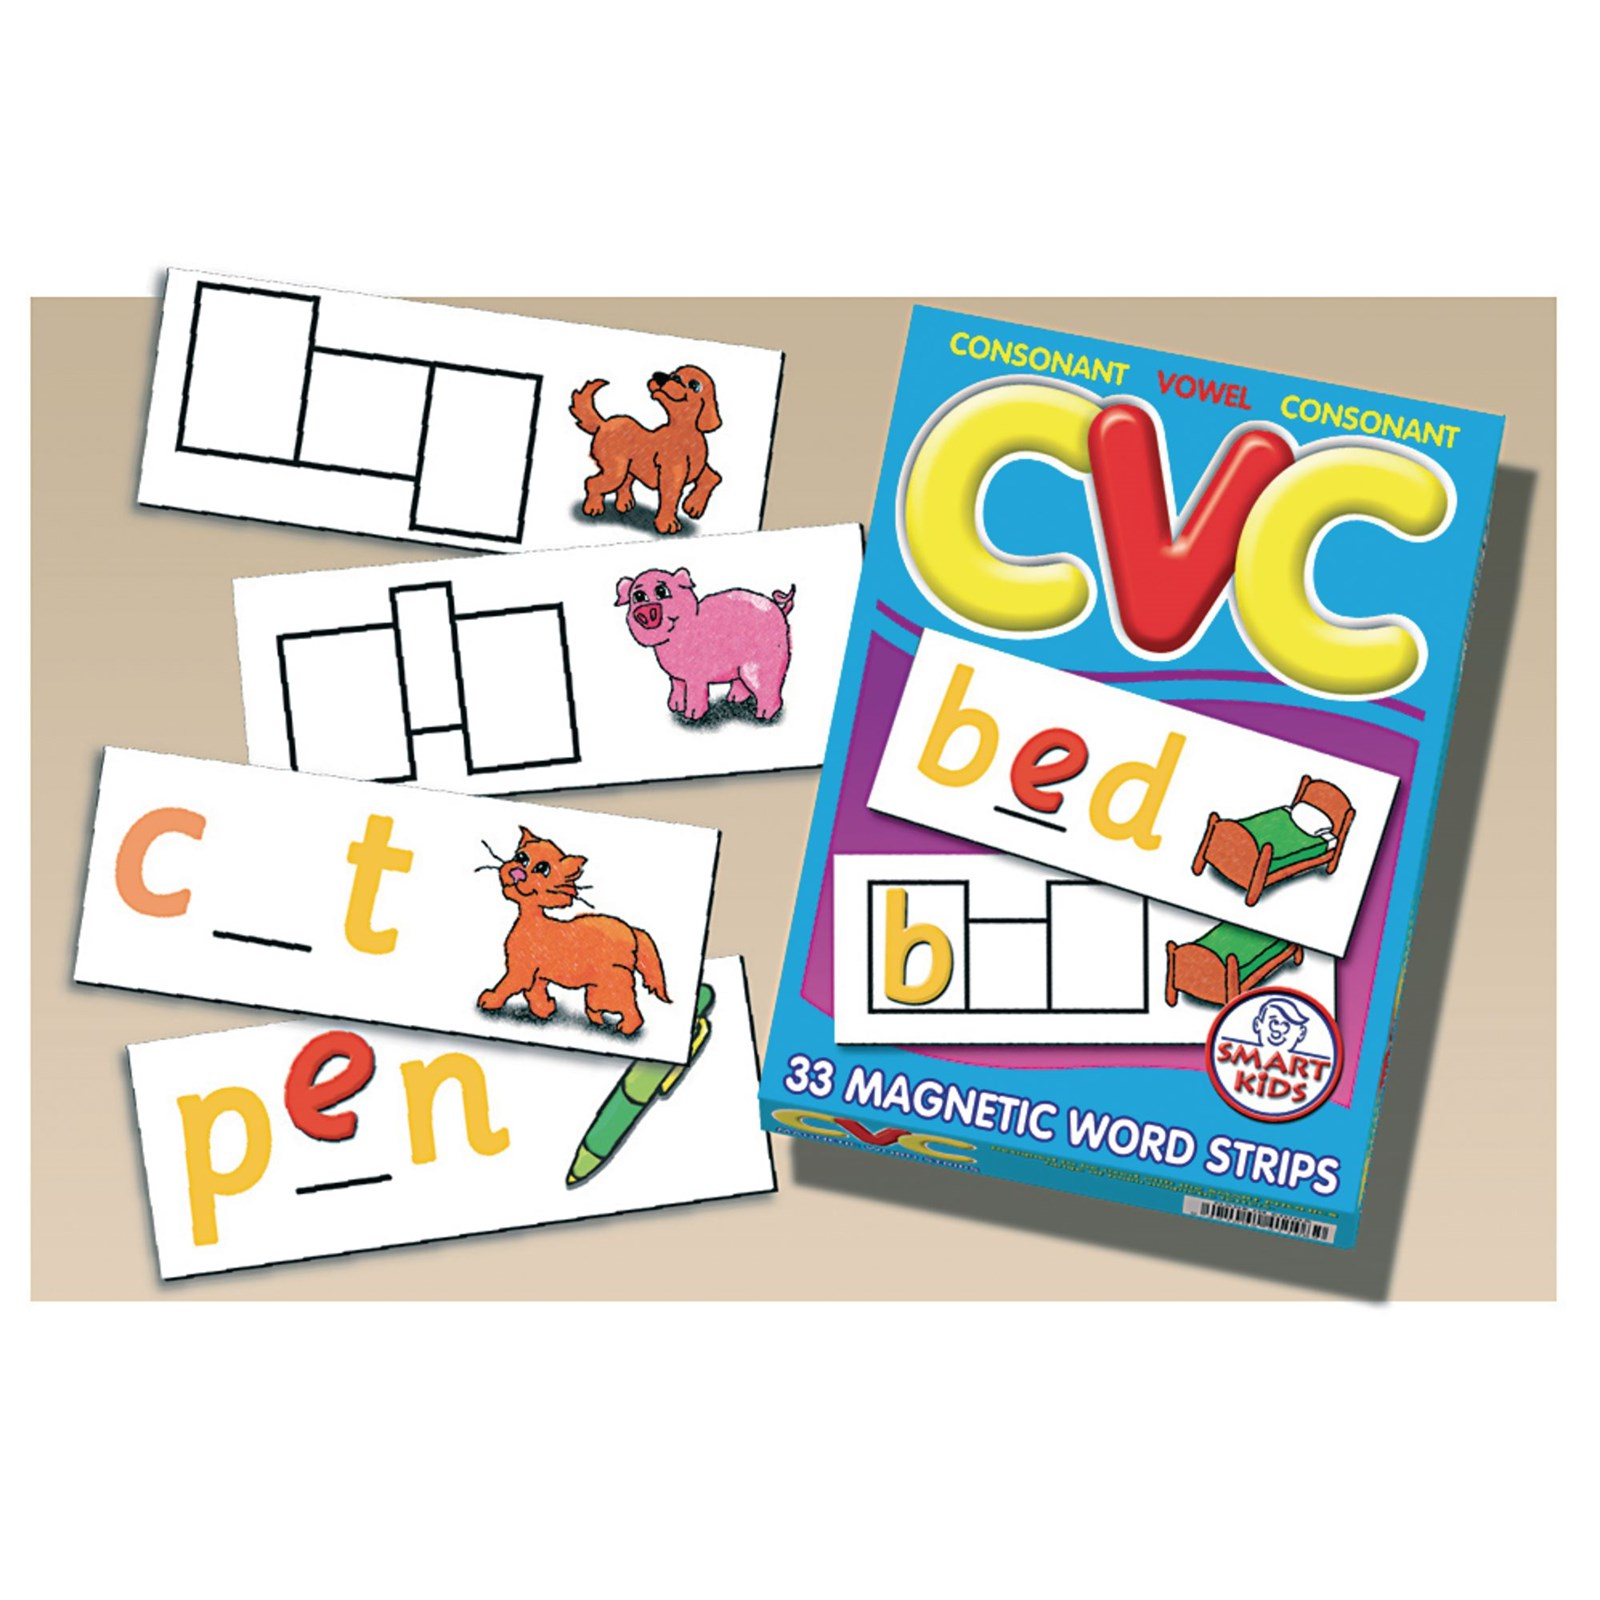 CVC Word Strips Pack of 33